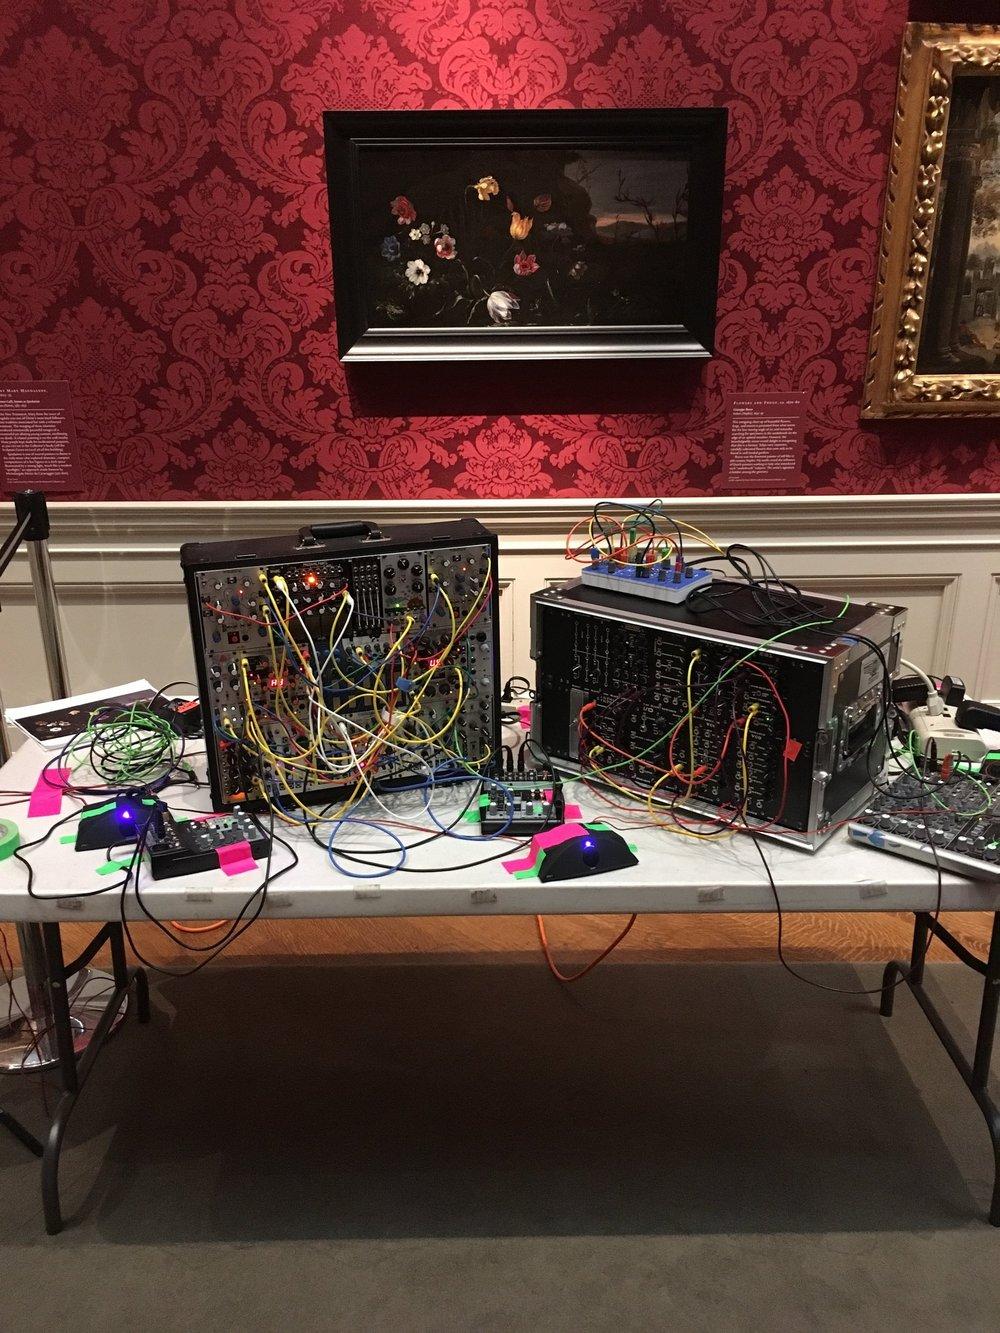 Jimmy Joe Roche's setup in the Renaissance Galleries